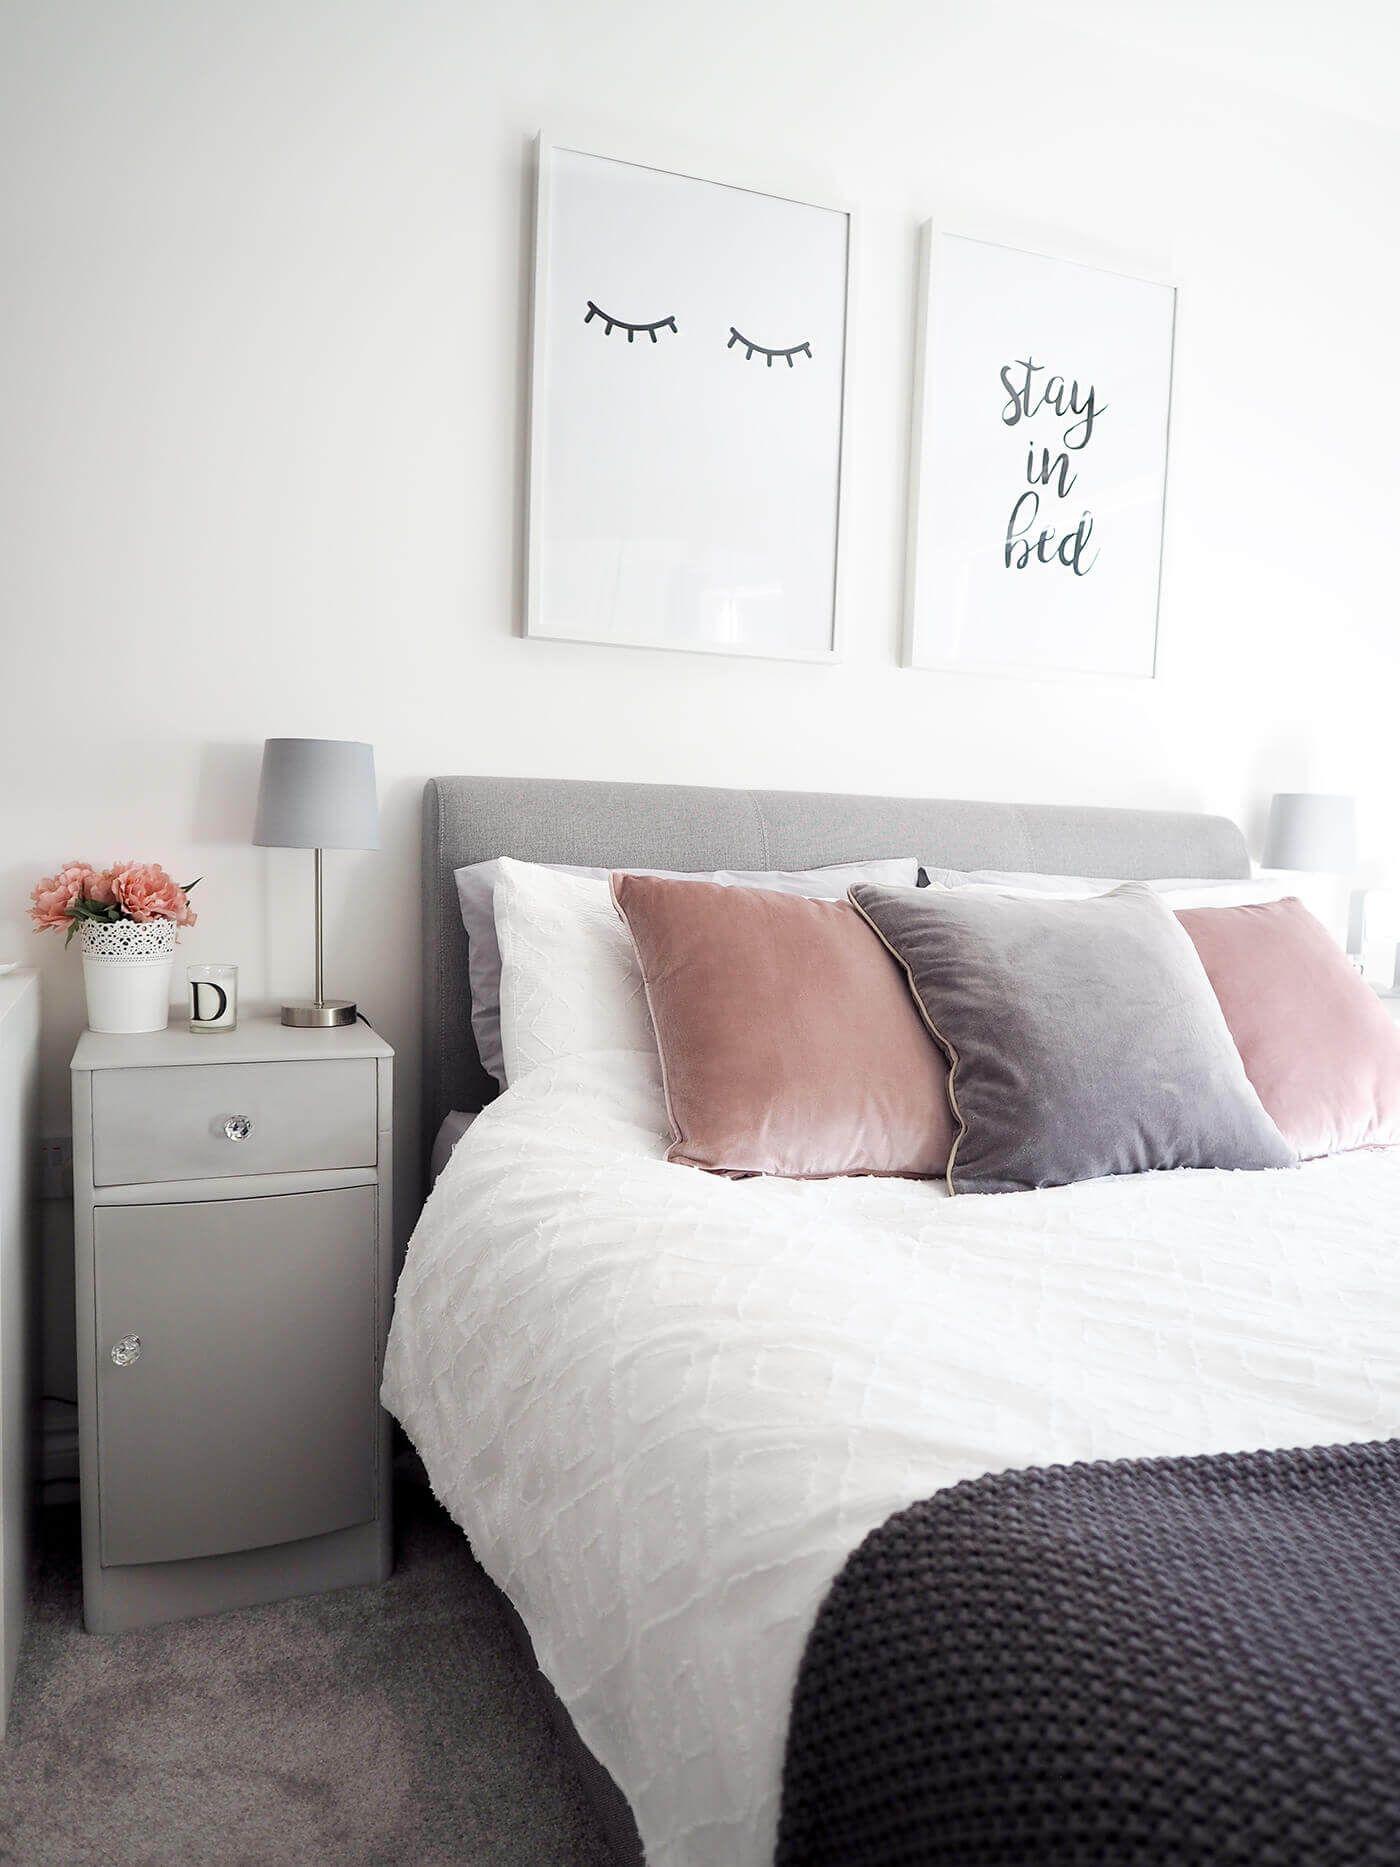 23+ Grey modern bedroom ideas ppdb 2021